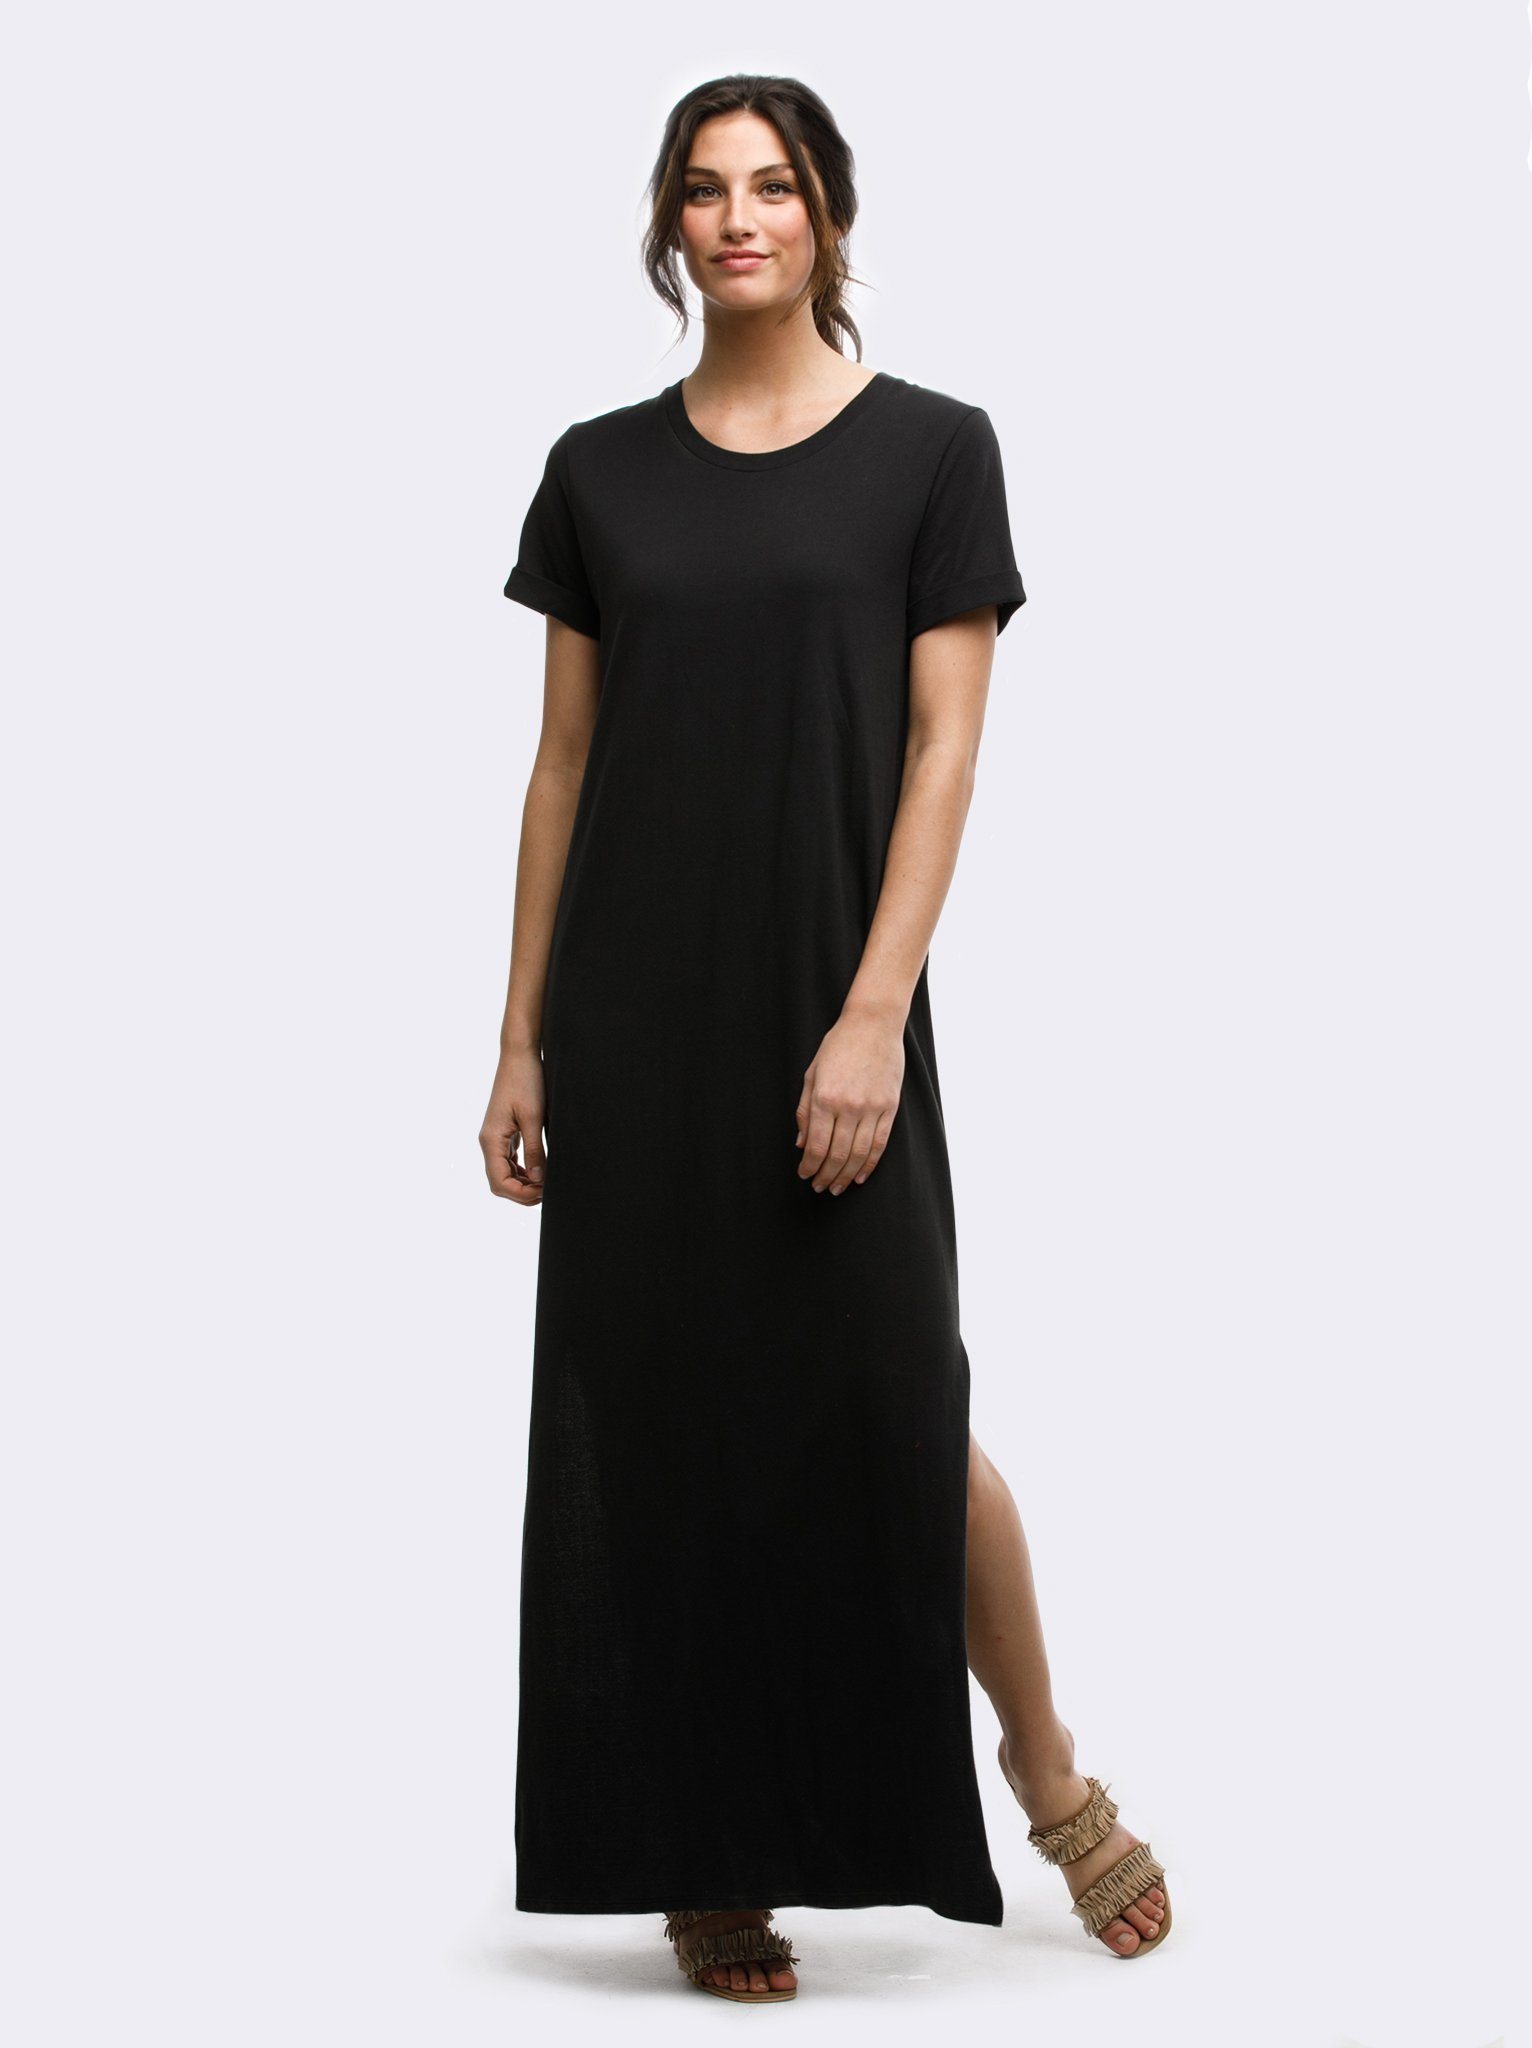 Susano Maxi T Shirt Dress Jumpsuit Dress Shirt Dress Cotton Knit Dresses [ 2048 x 1532 Pixel ]